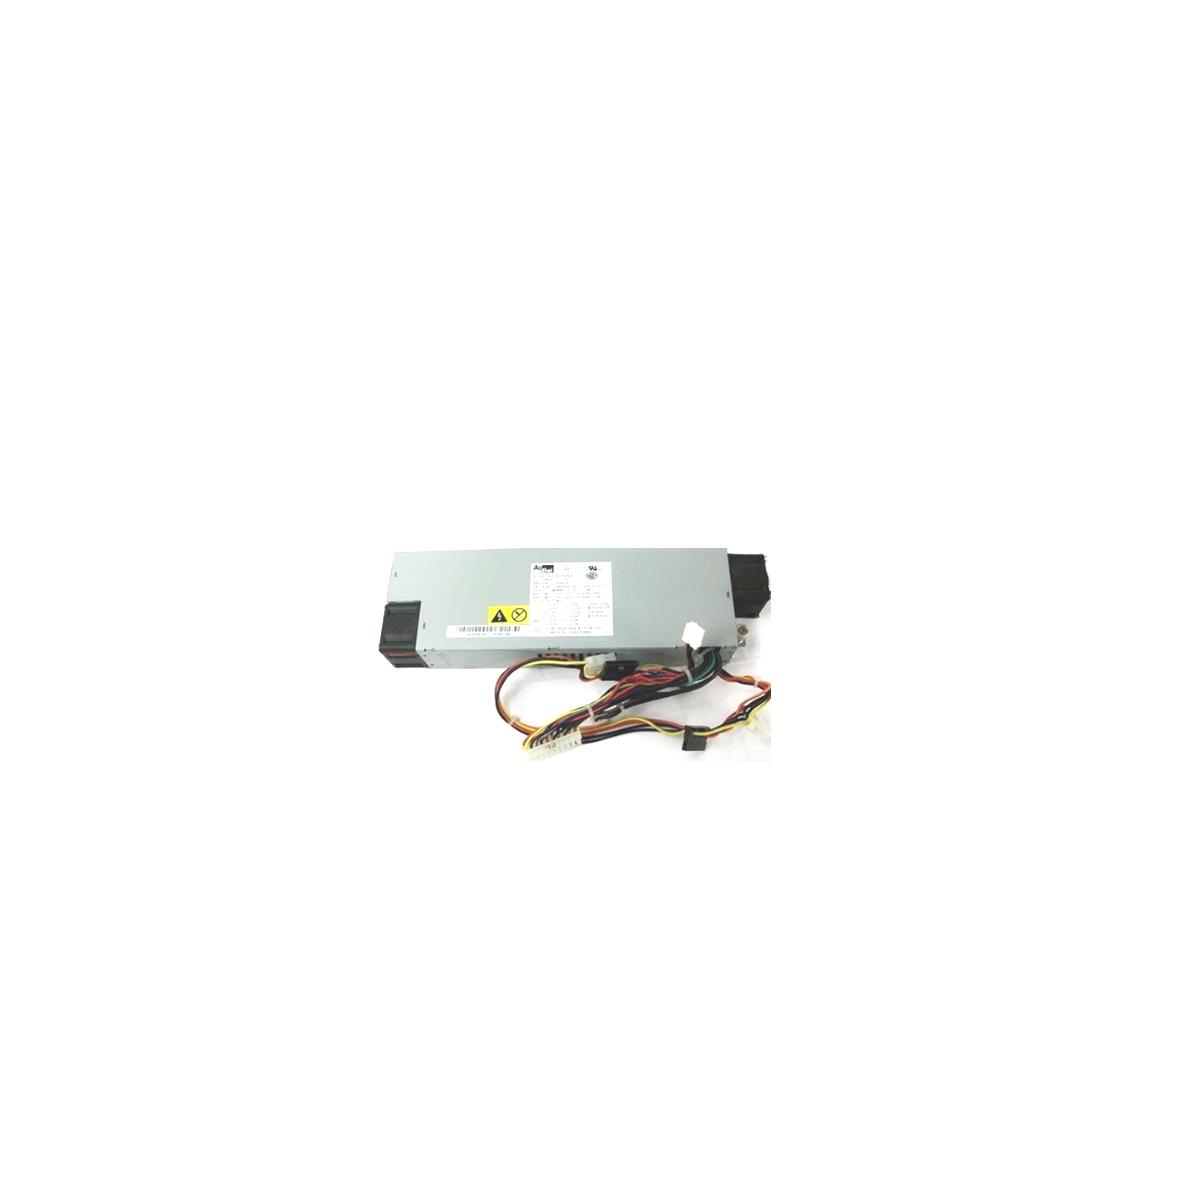 PAMIEC KINGSTON KVR667D2D8P5/2G 2GB PC2-5300